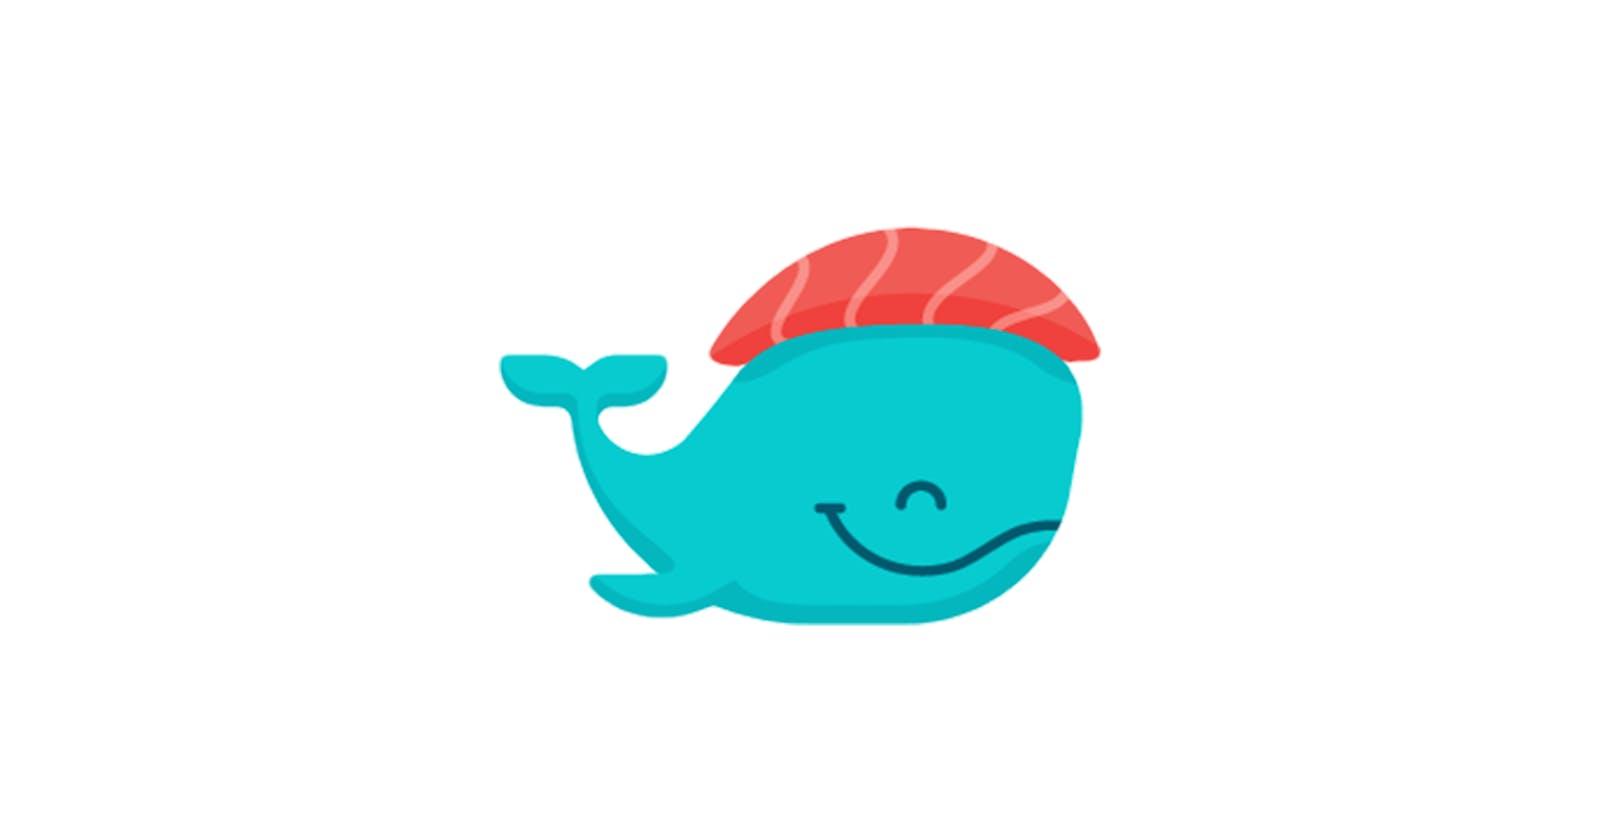 Create your own Heroku with Dokku on DigitalOcean